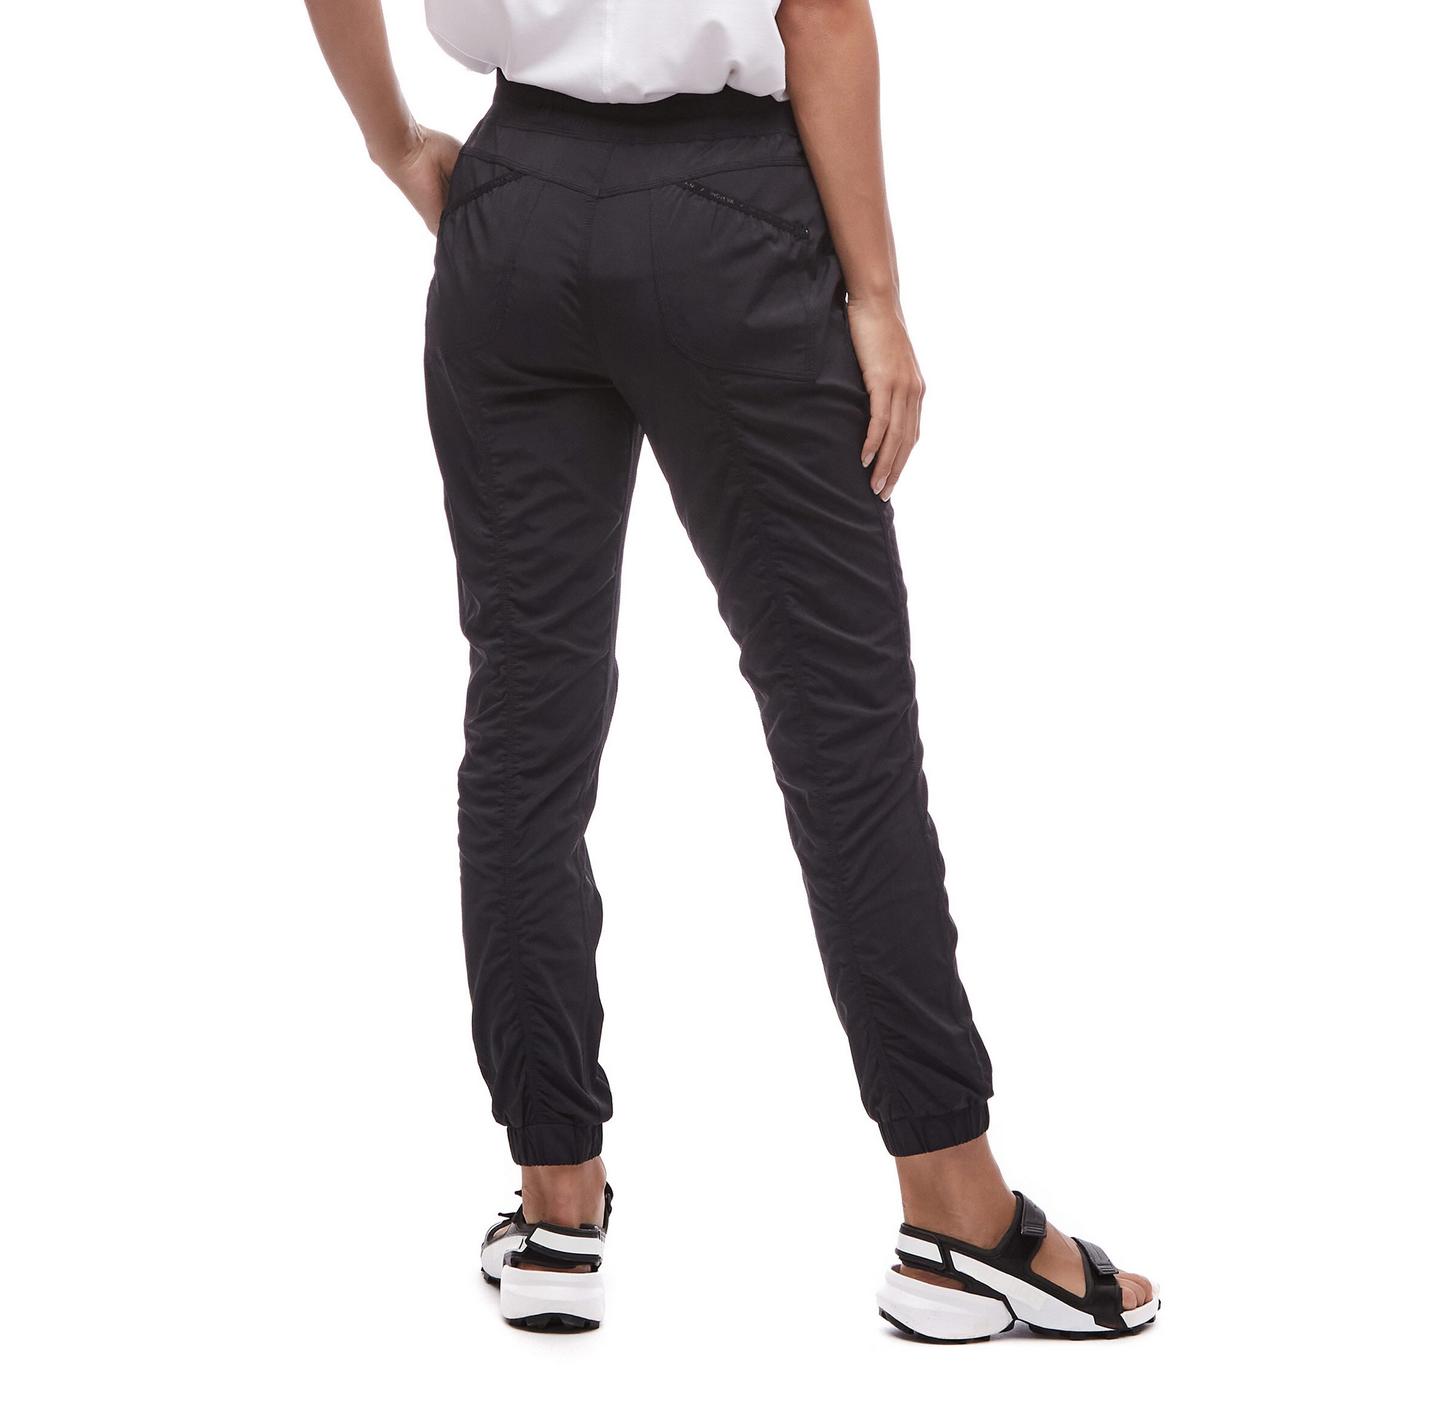 Women's Maeto III Pant Black-2